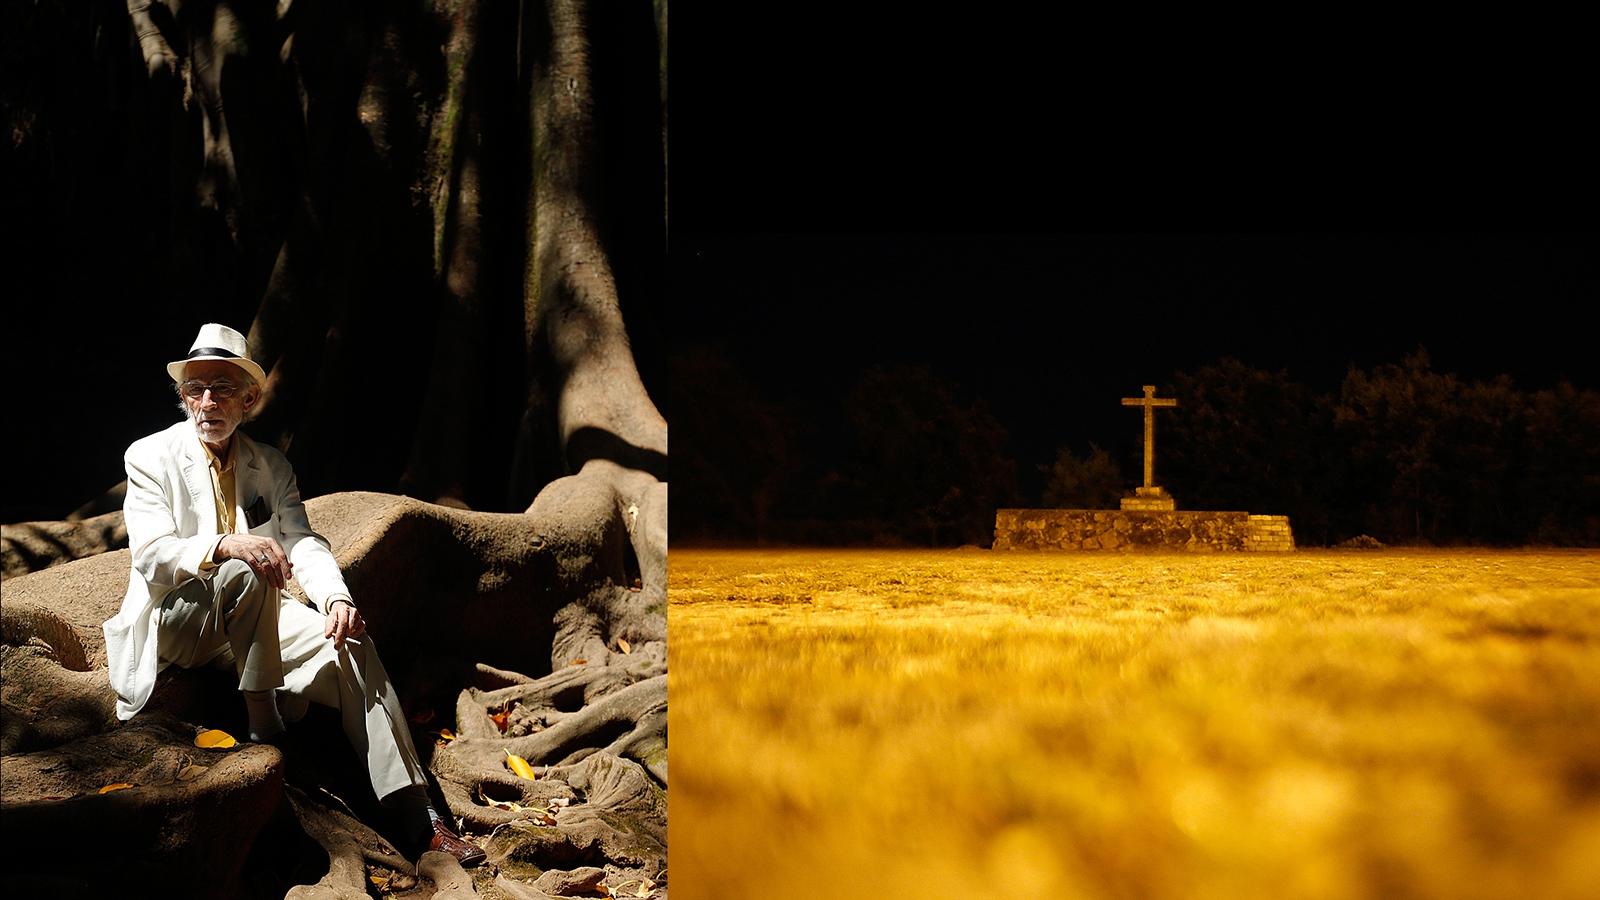 Art and Documentary Photography - Loading __TheresaOrtolani_06.jpg